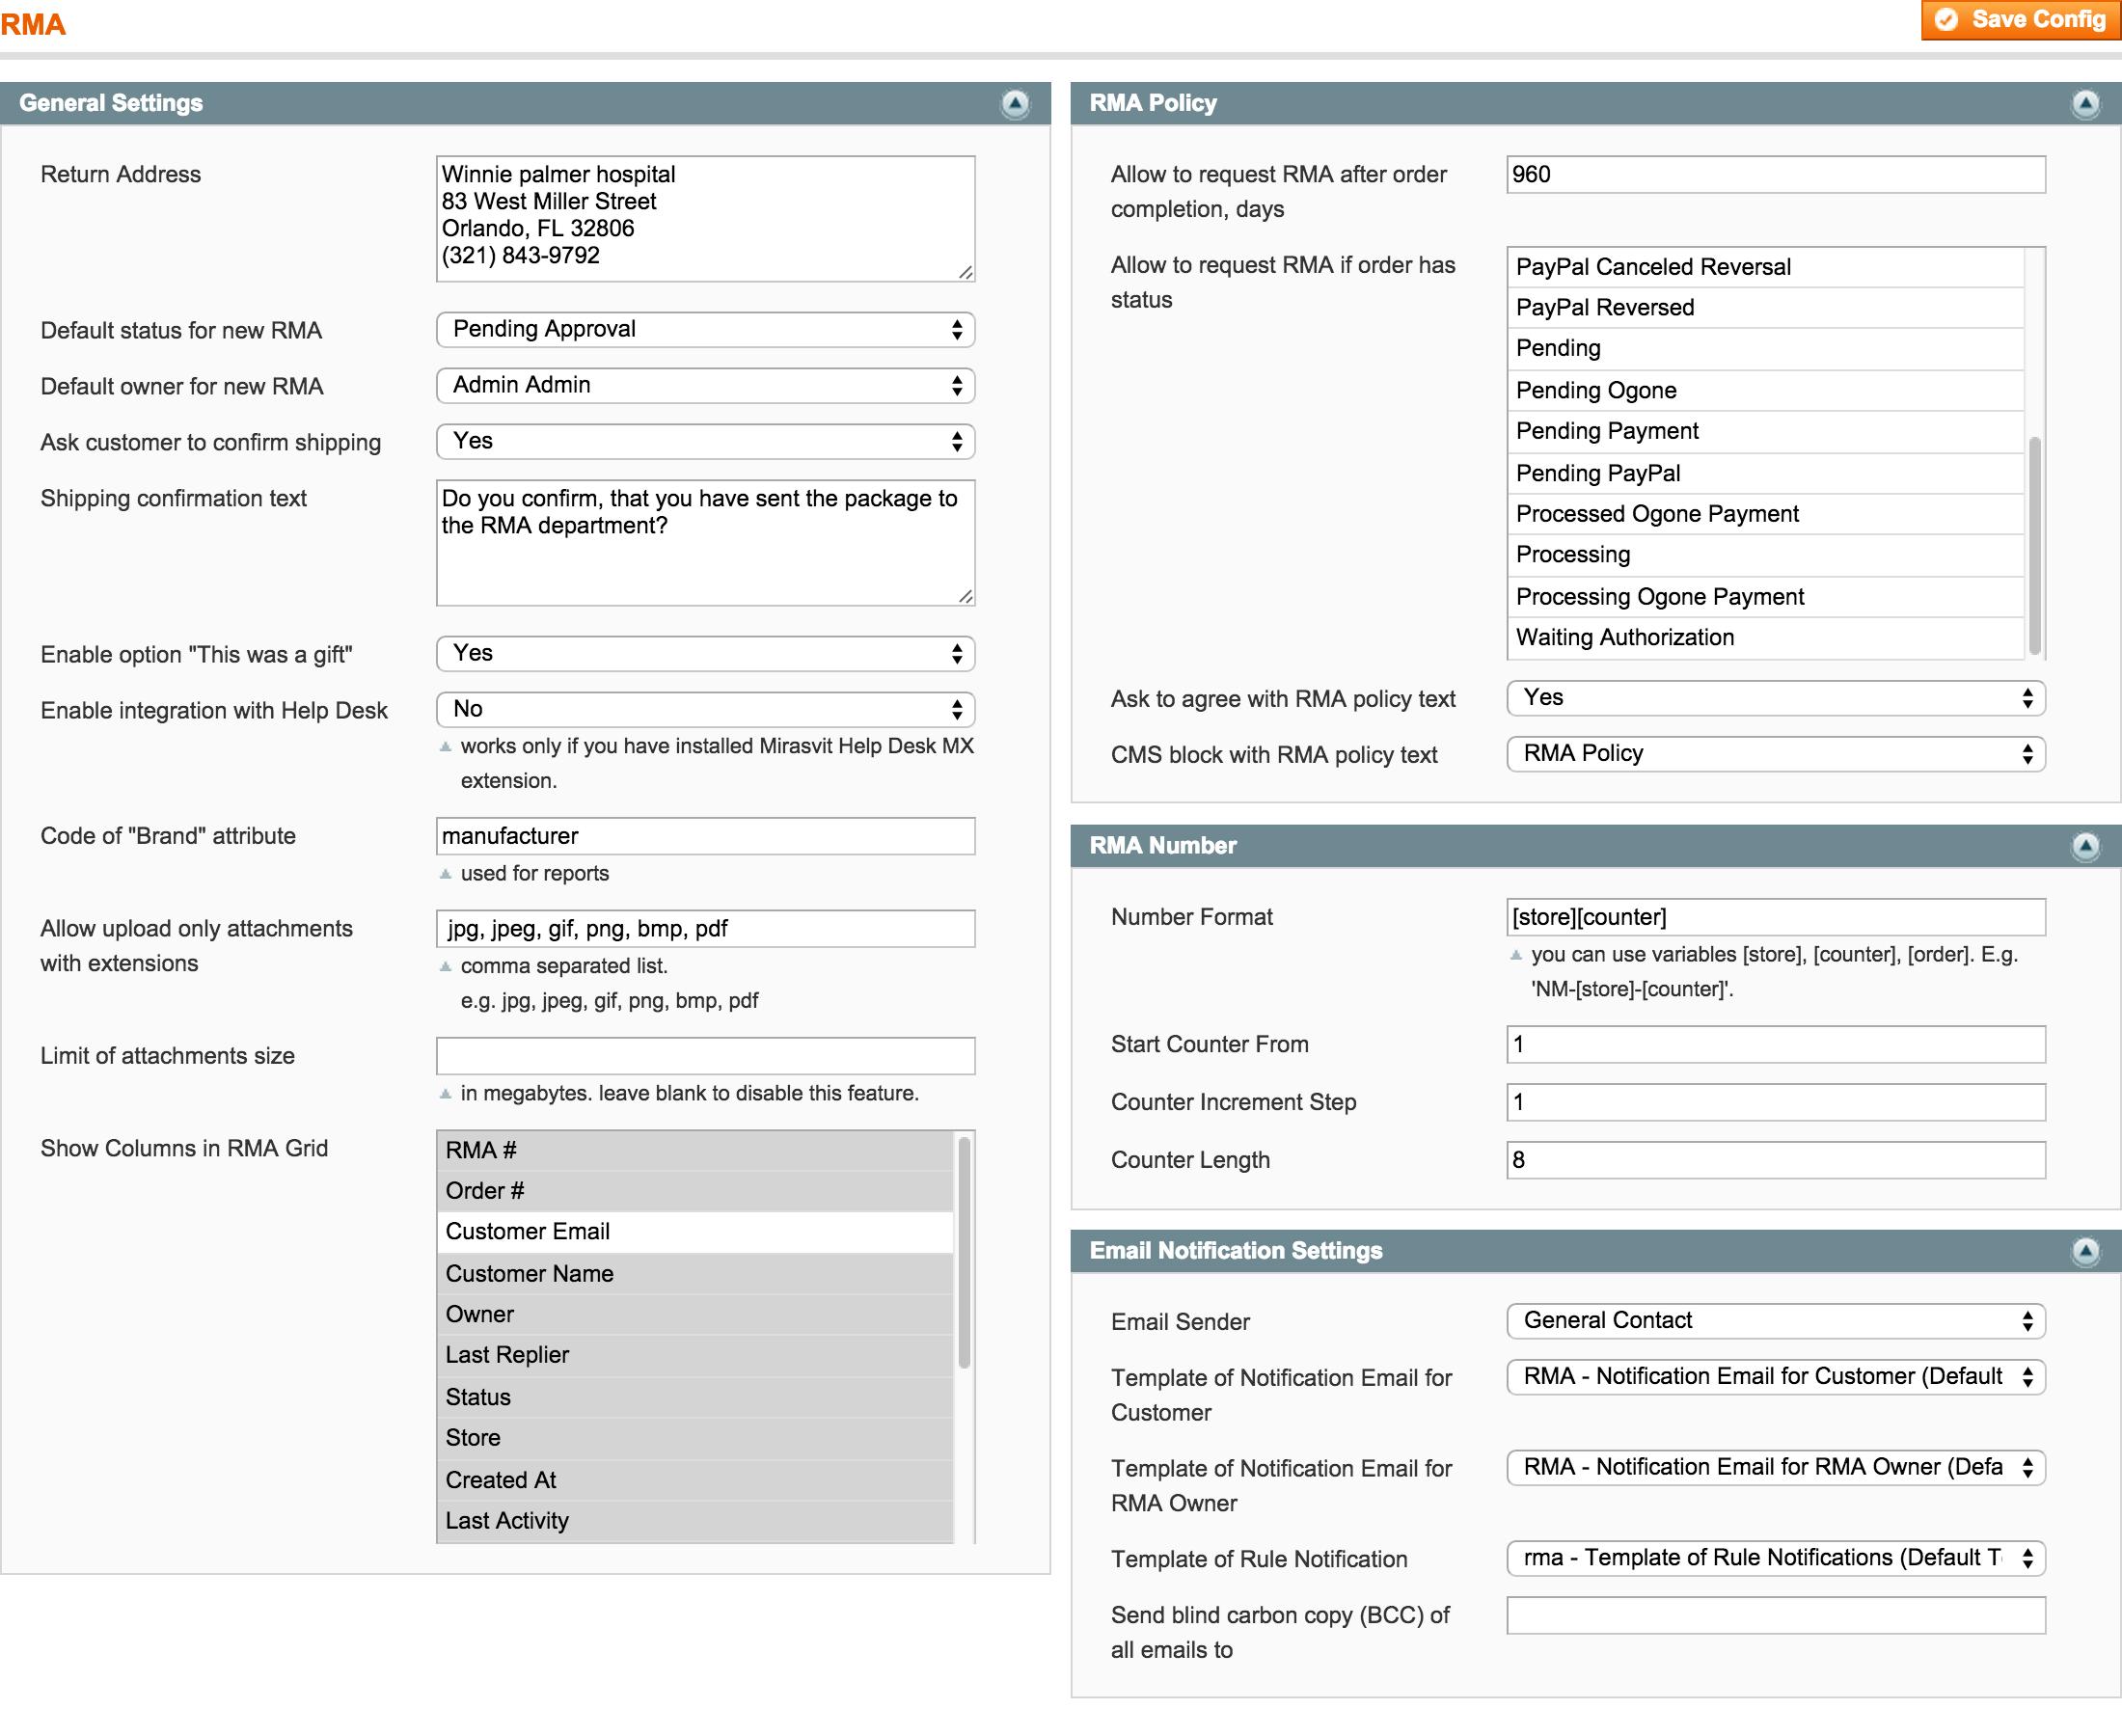 RMA Backend - General Configuration